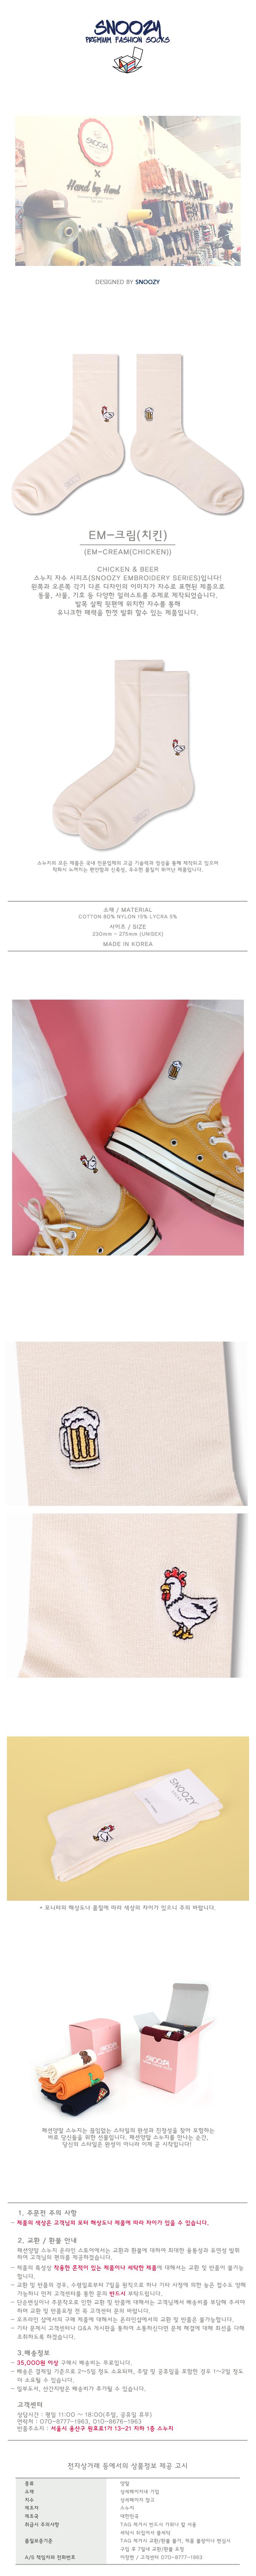 EM-크림(치킨) - 스누지, 6,500원, 여성양말, 패션양말